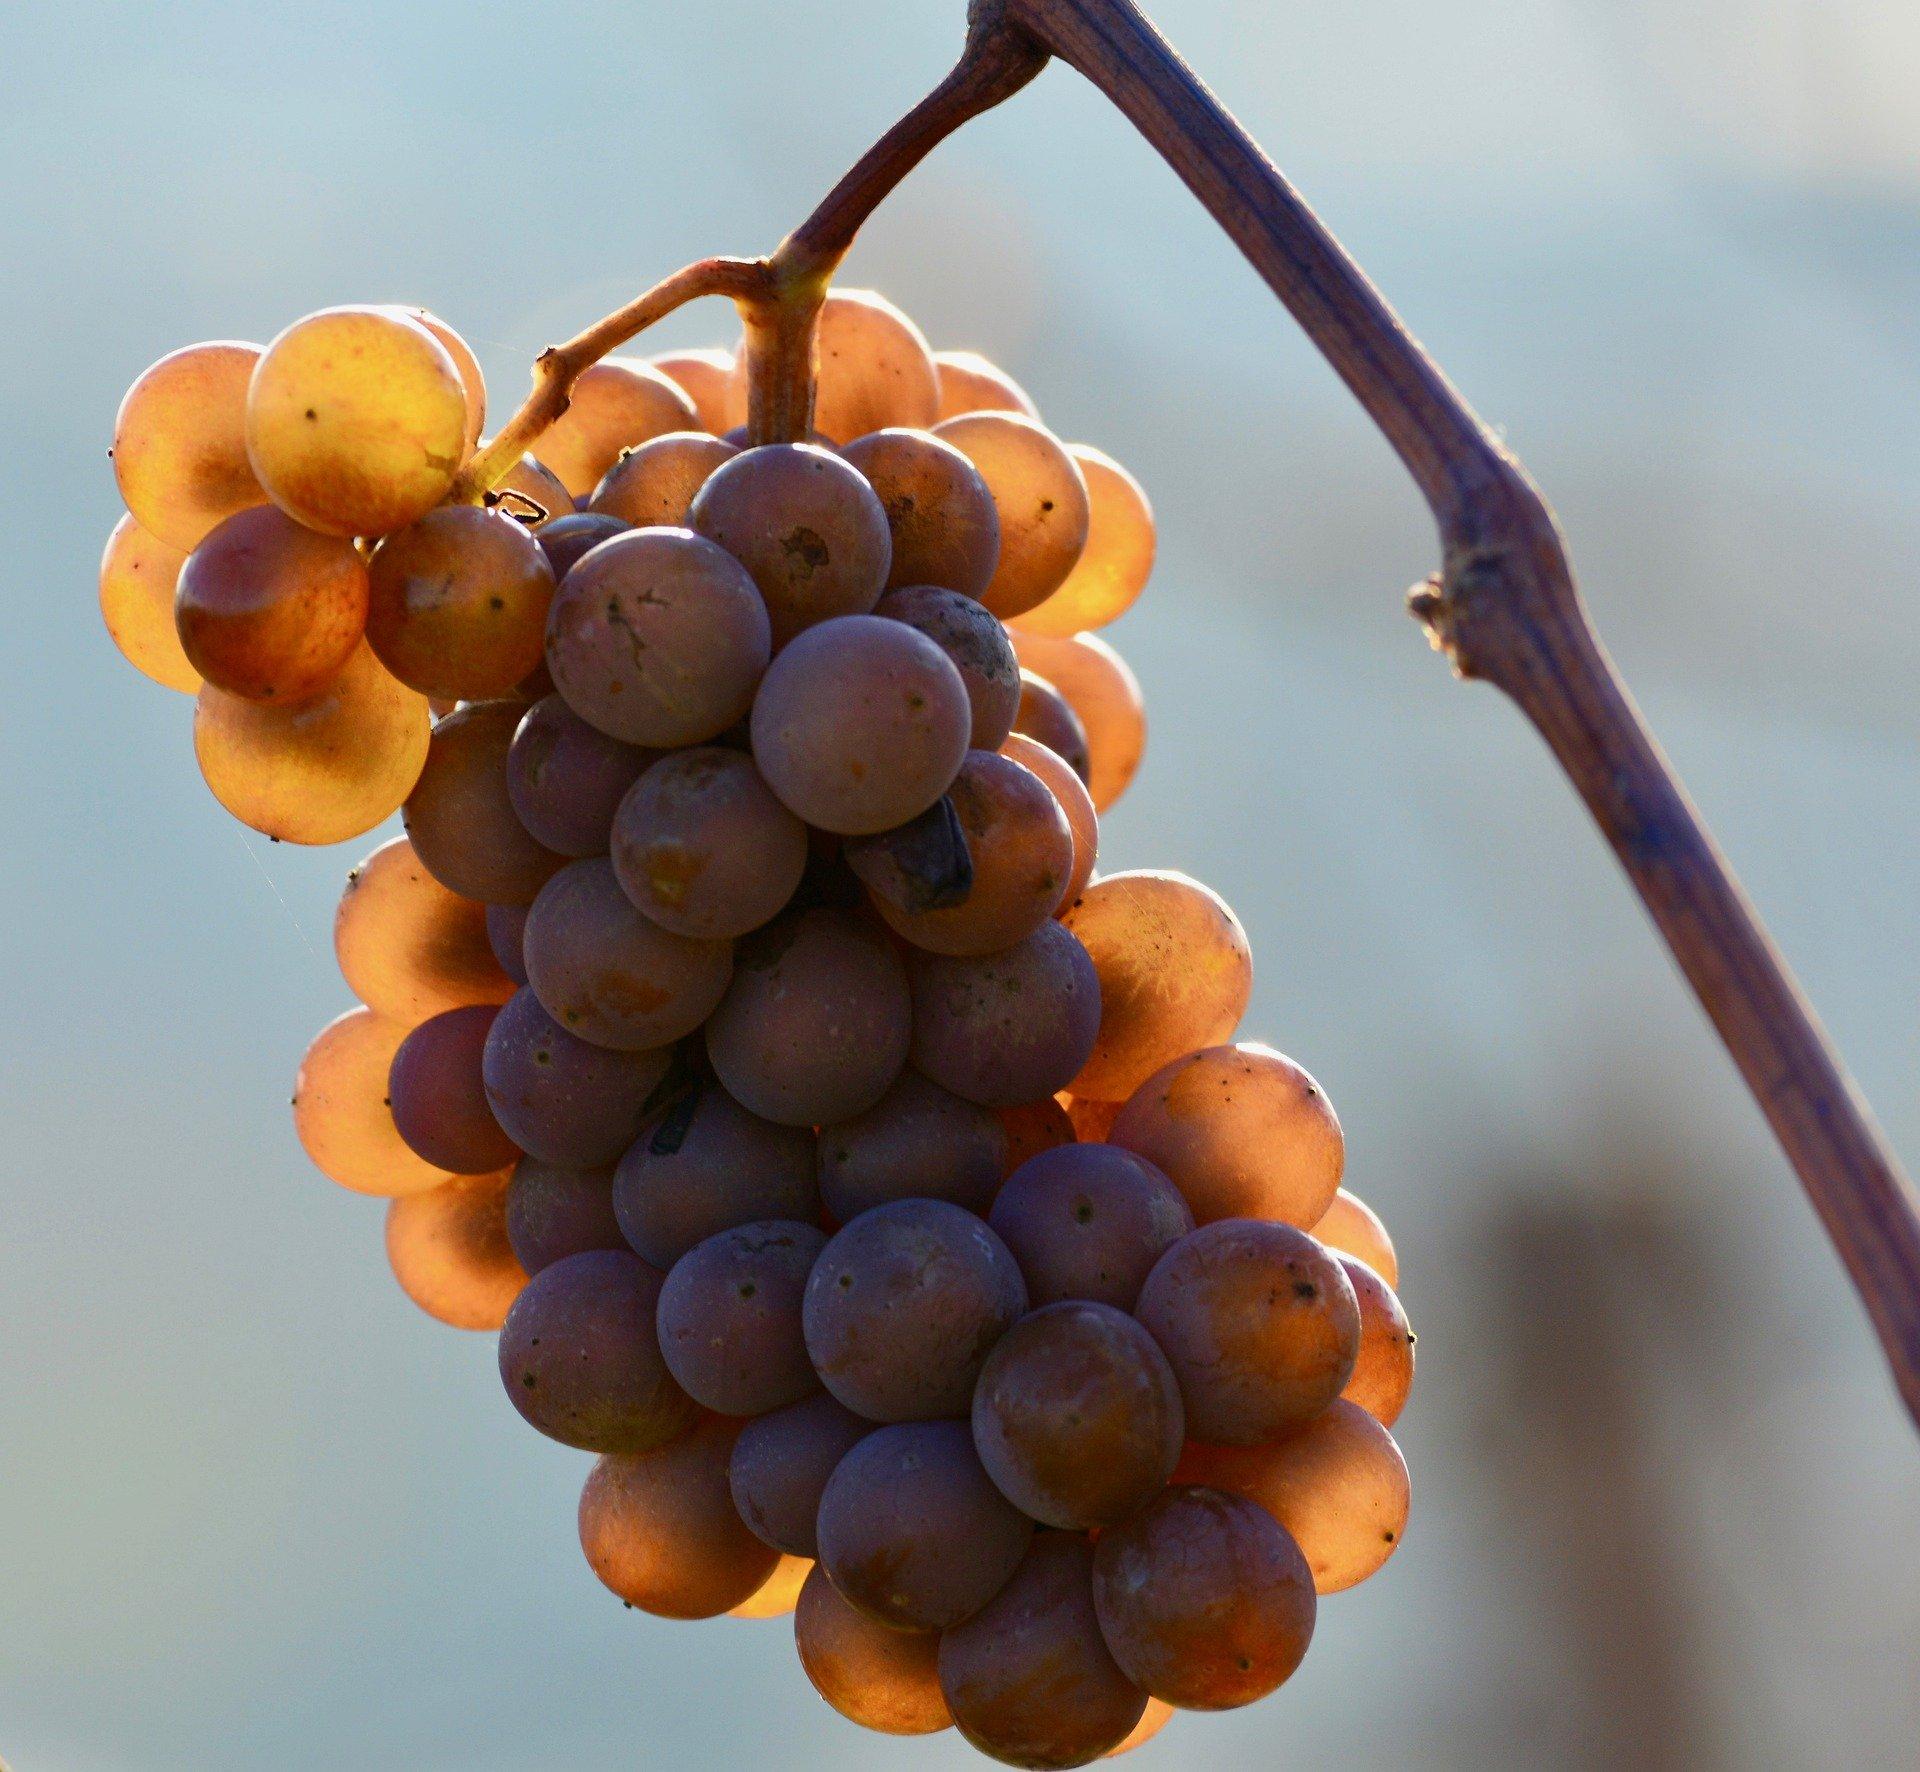 grape de raisin blanc vin doux